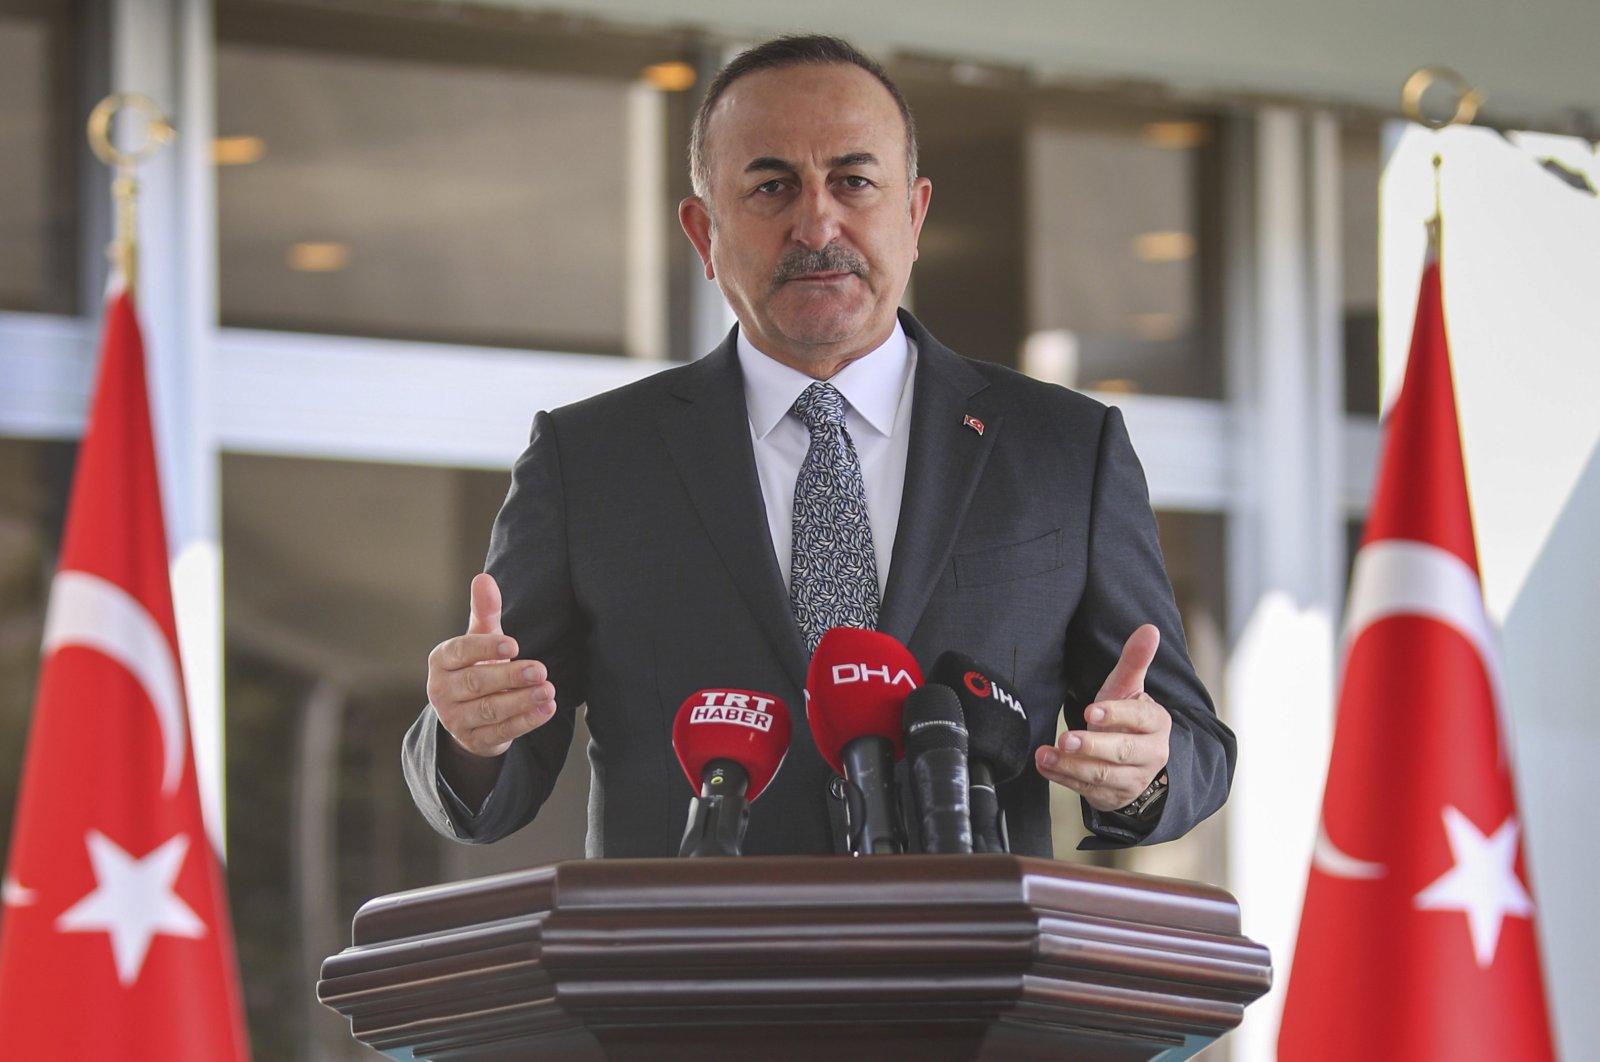 Foreign Minister Mevlüt Çavuşoğlu speaks to the media in Ankara, Turkey, March 25, 2020. (AP Photo)